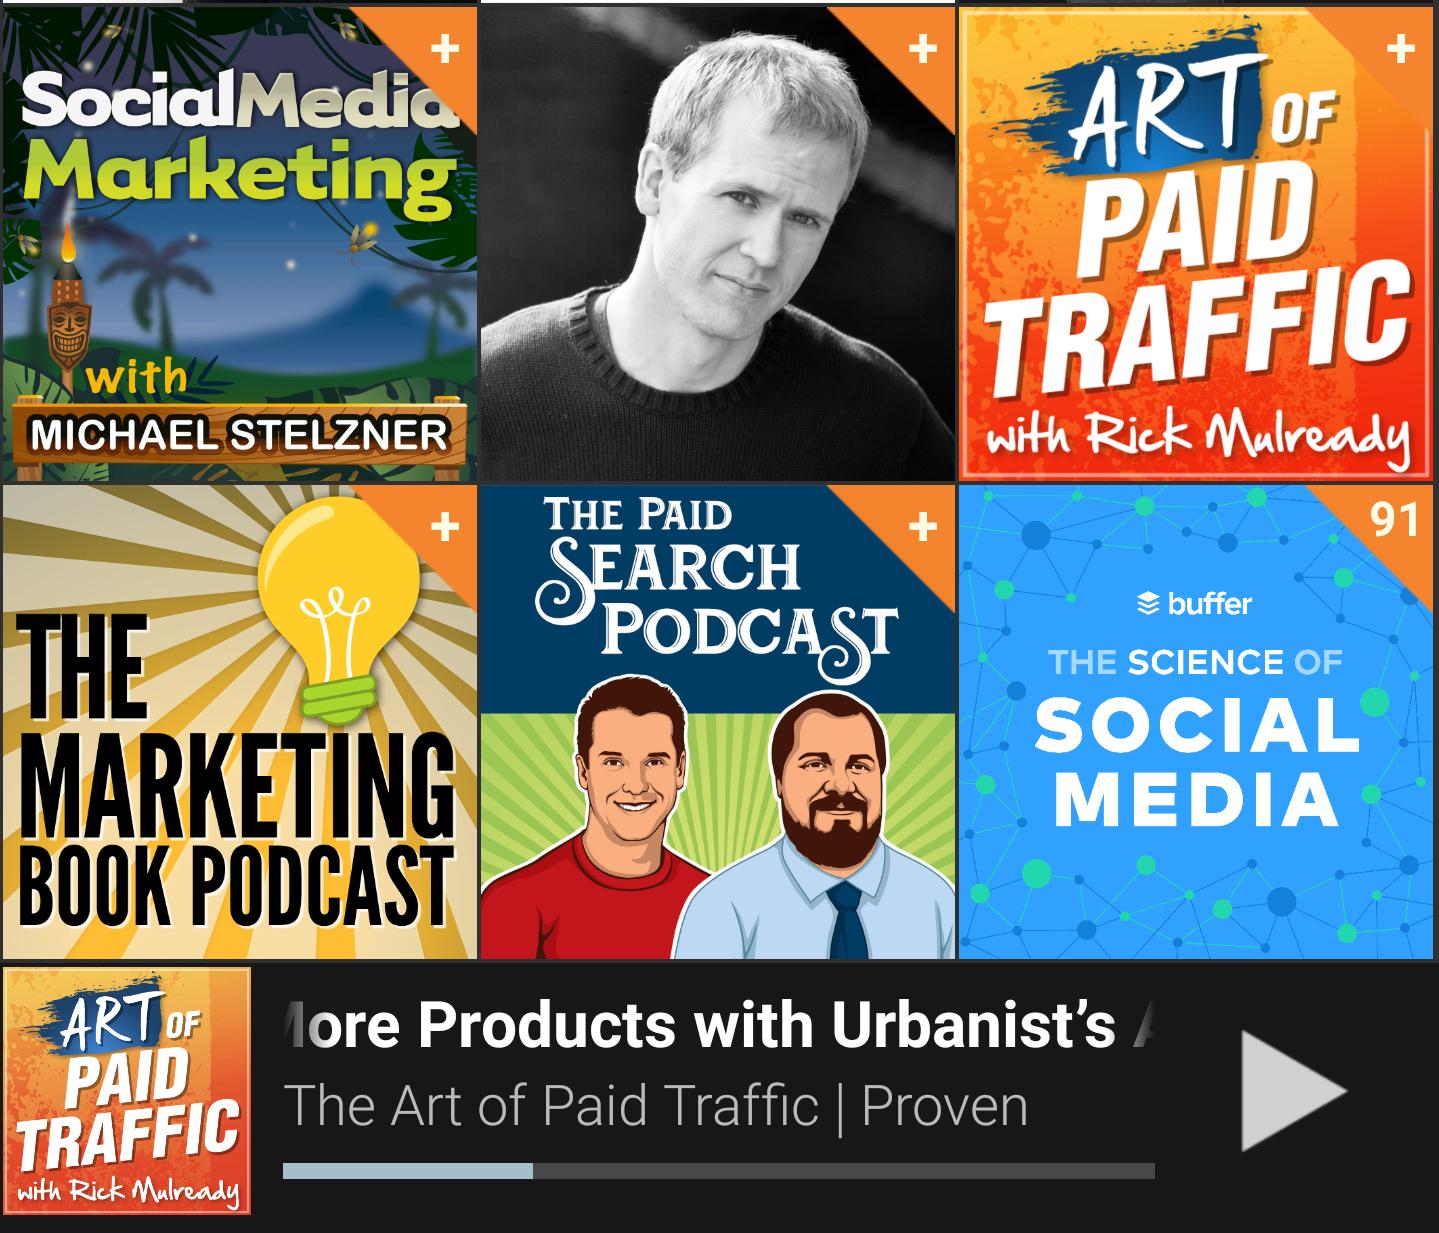 Podcasty o social media, content marketingu, SEO i digital marketingu – 7 rekomendacji